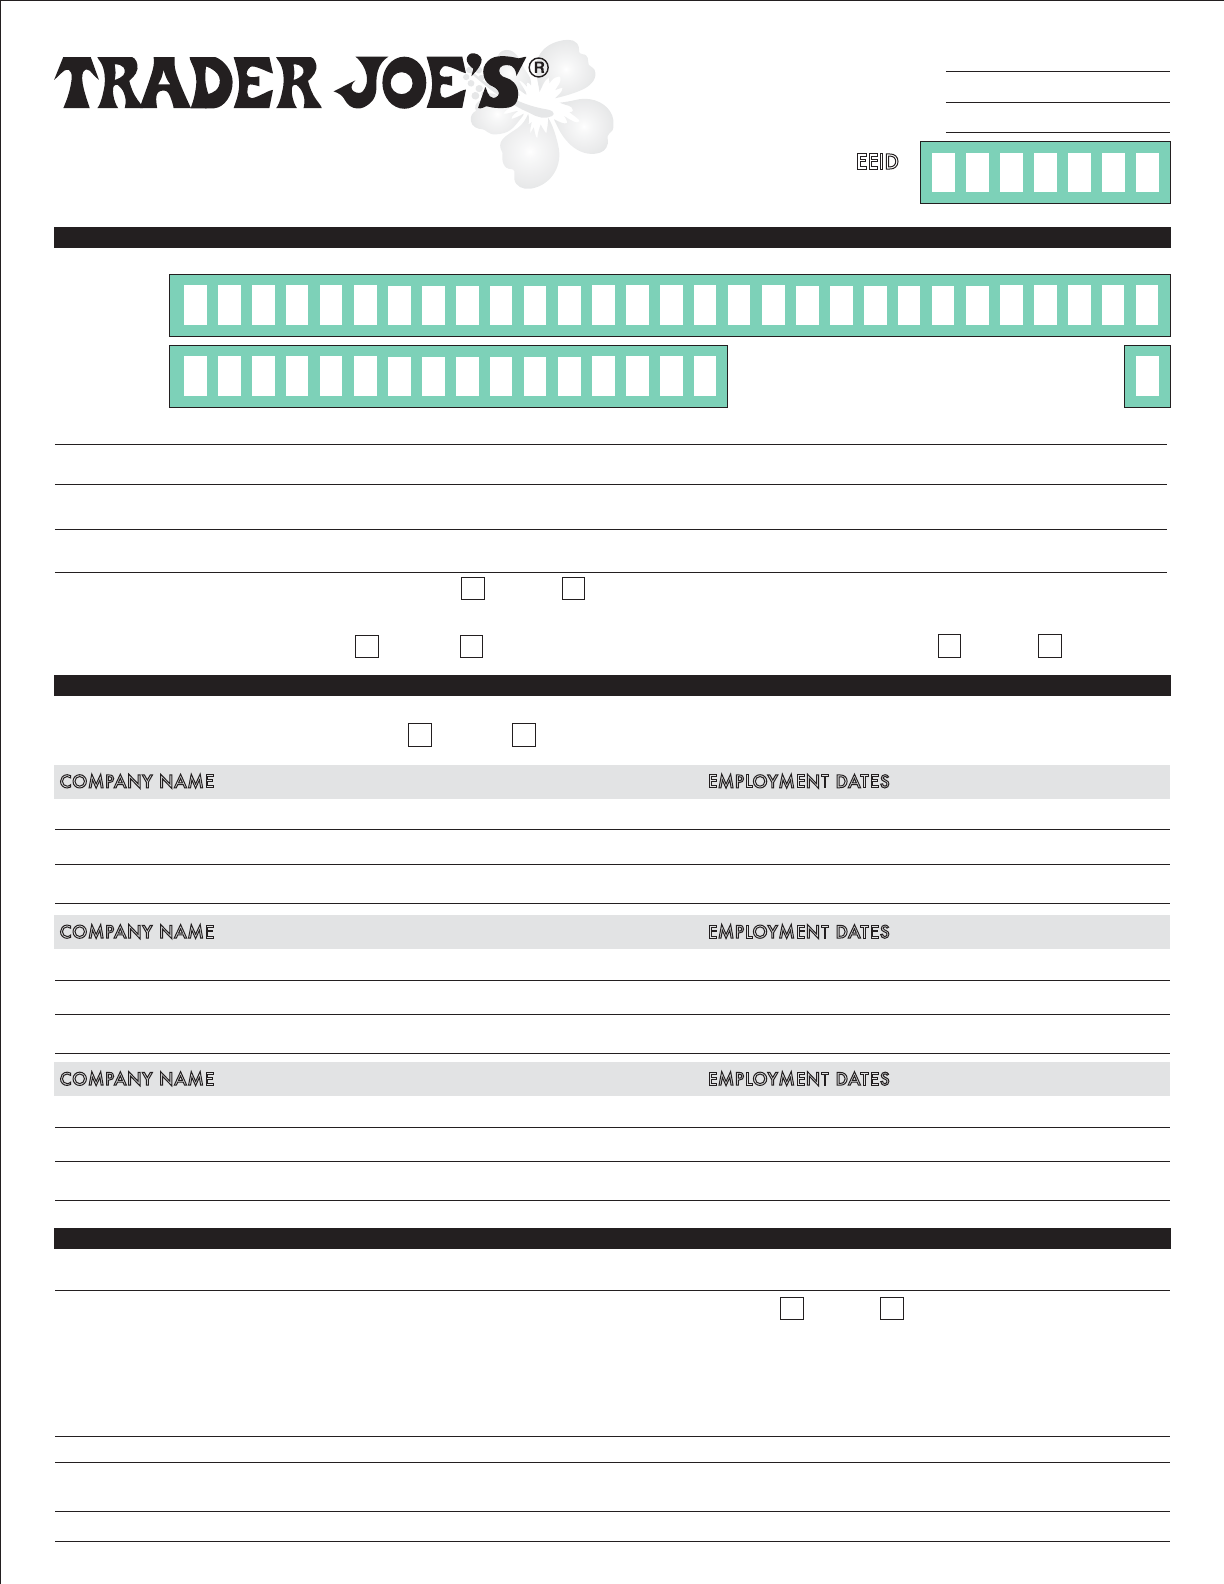 Free Printable Trader Joe\'s Job Application Form